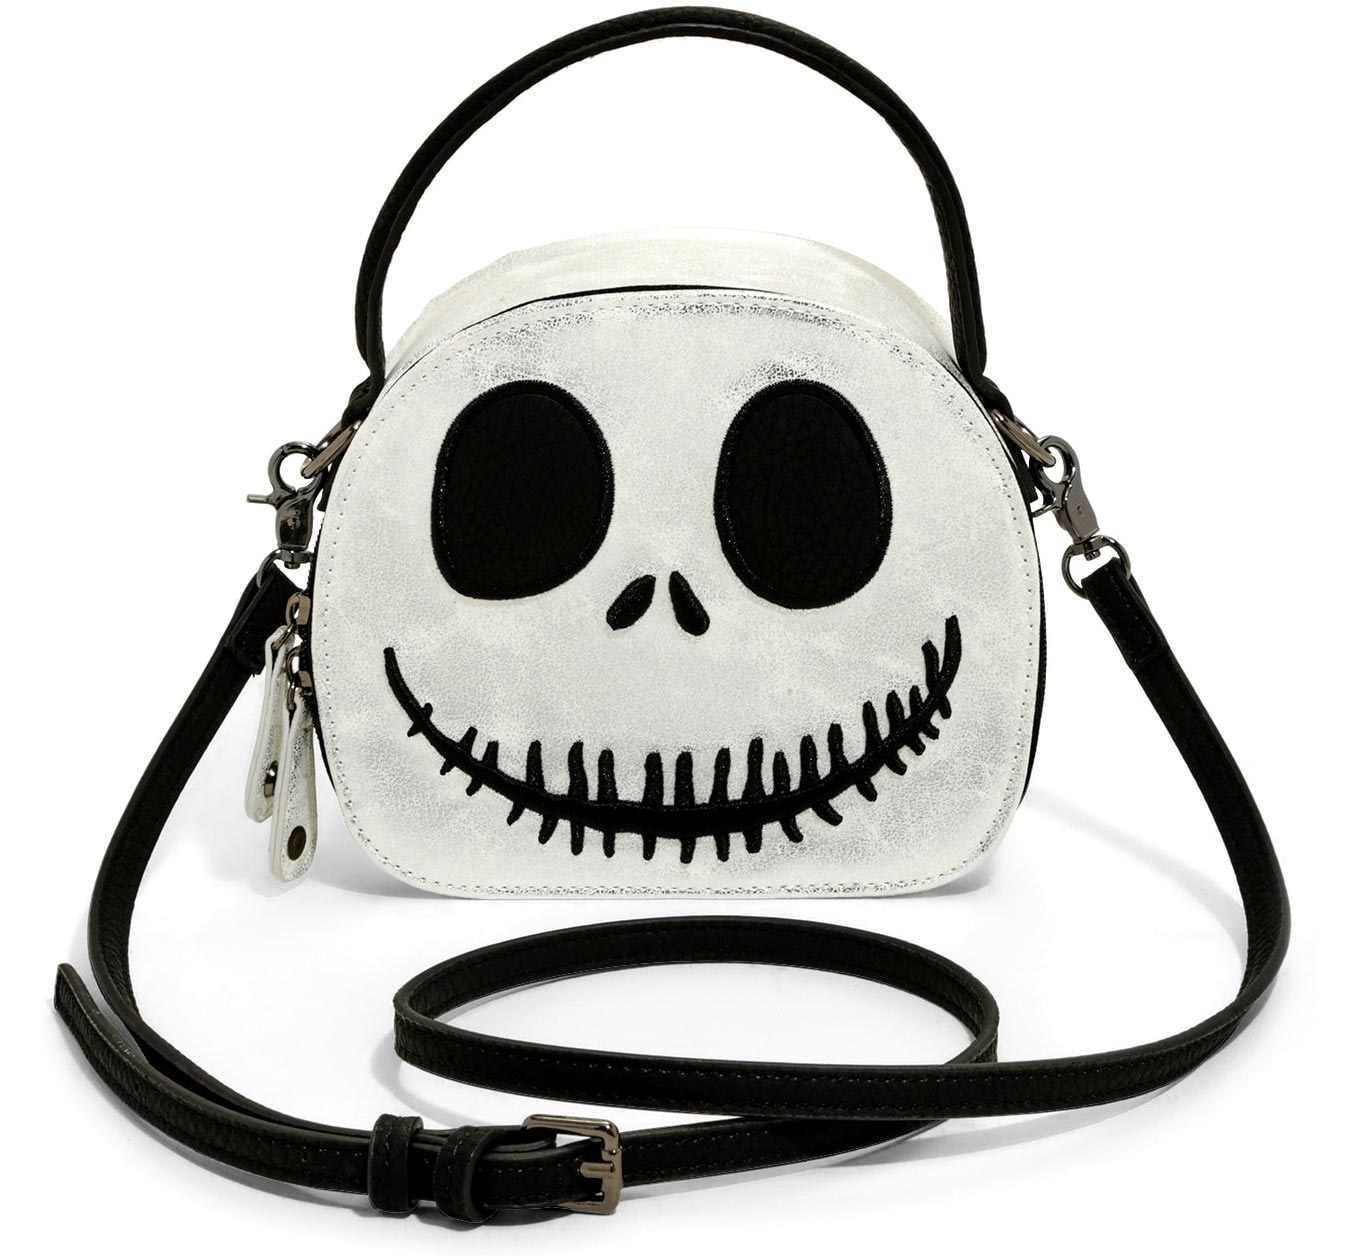 Nightmare Before Christmas Purses Handbags.The Nightmare Before Christmas Jack Mini Hatbox Crossbody Bag